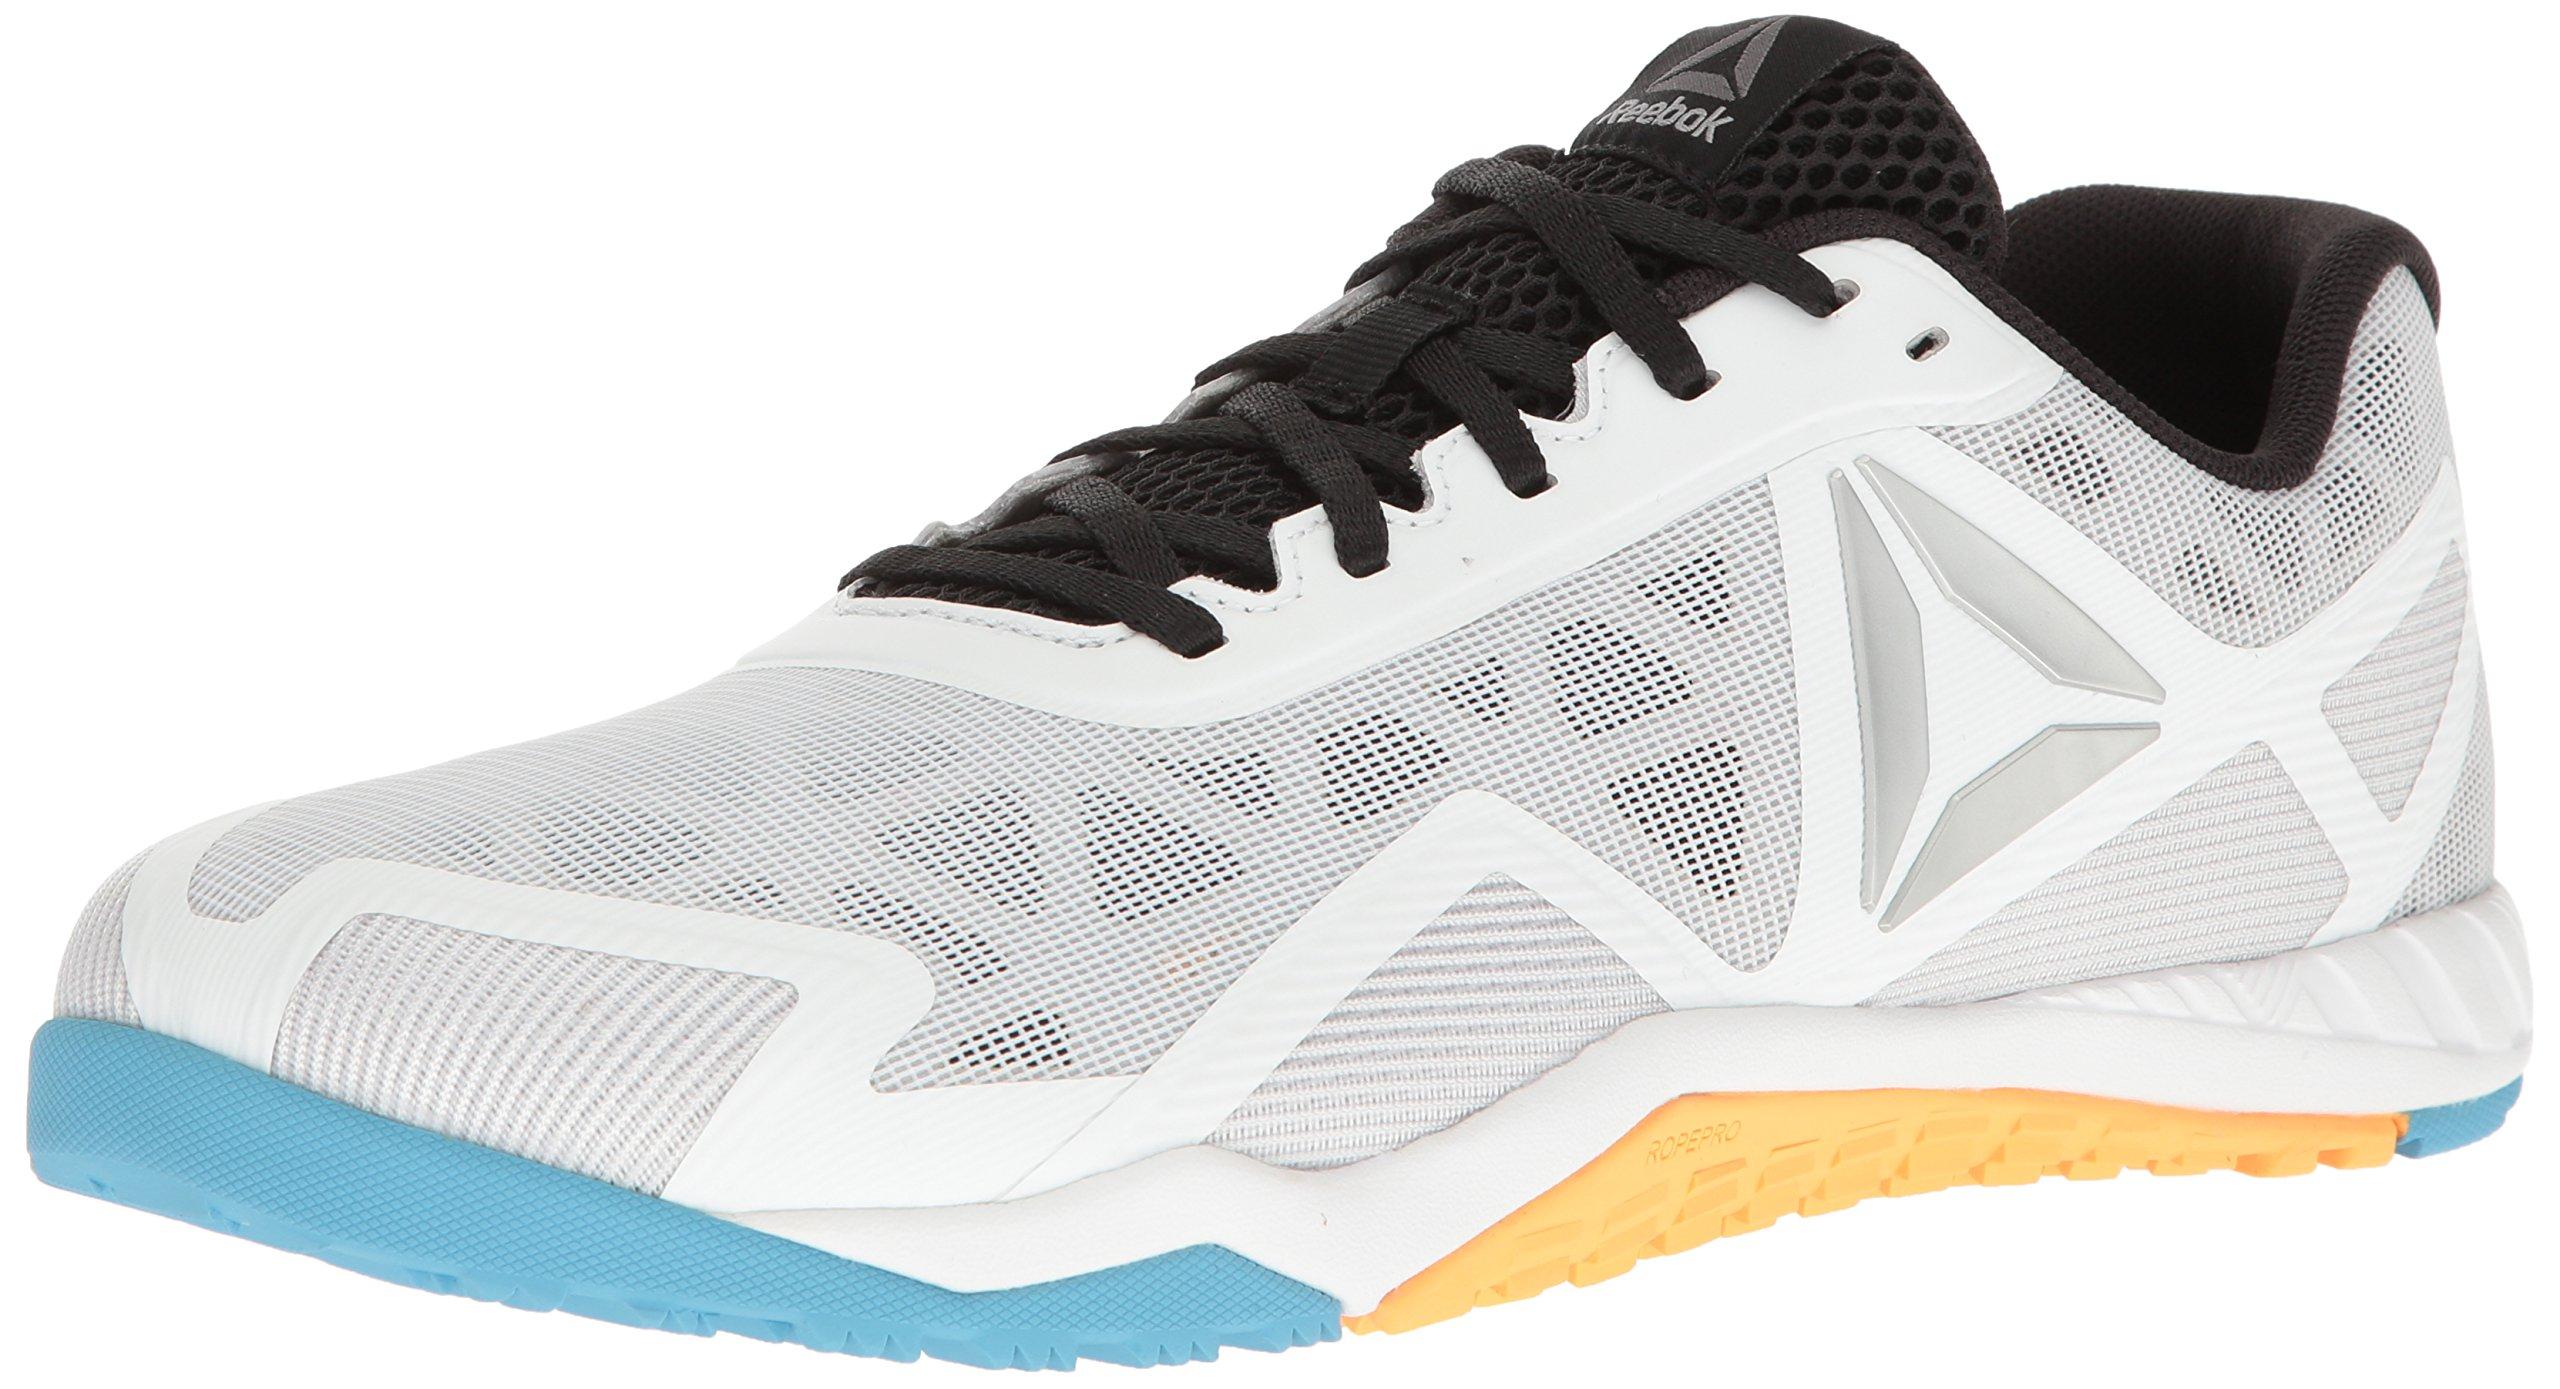 b04bcb6197 Reebok Men's ROS Workout TR 2.0 Cross-Trainer Shoe, White/Black/Blue  Beam/Fir, 11.5 M US